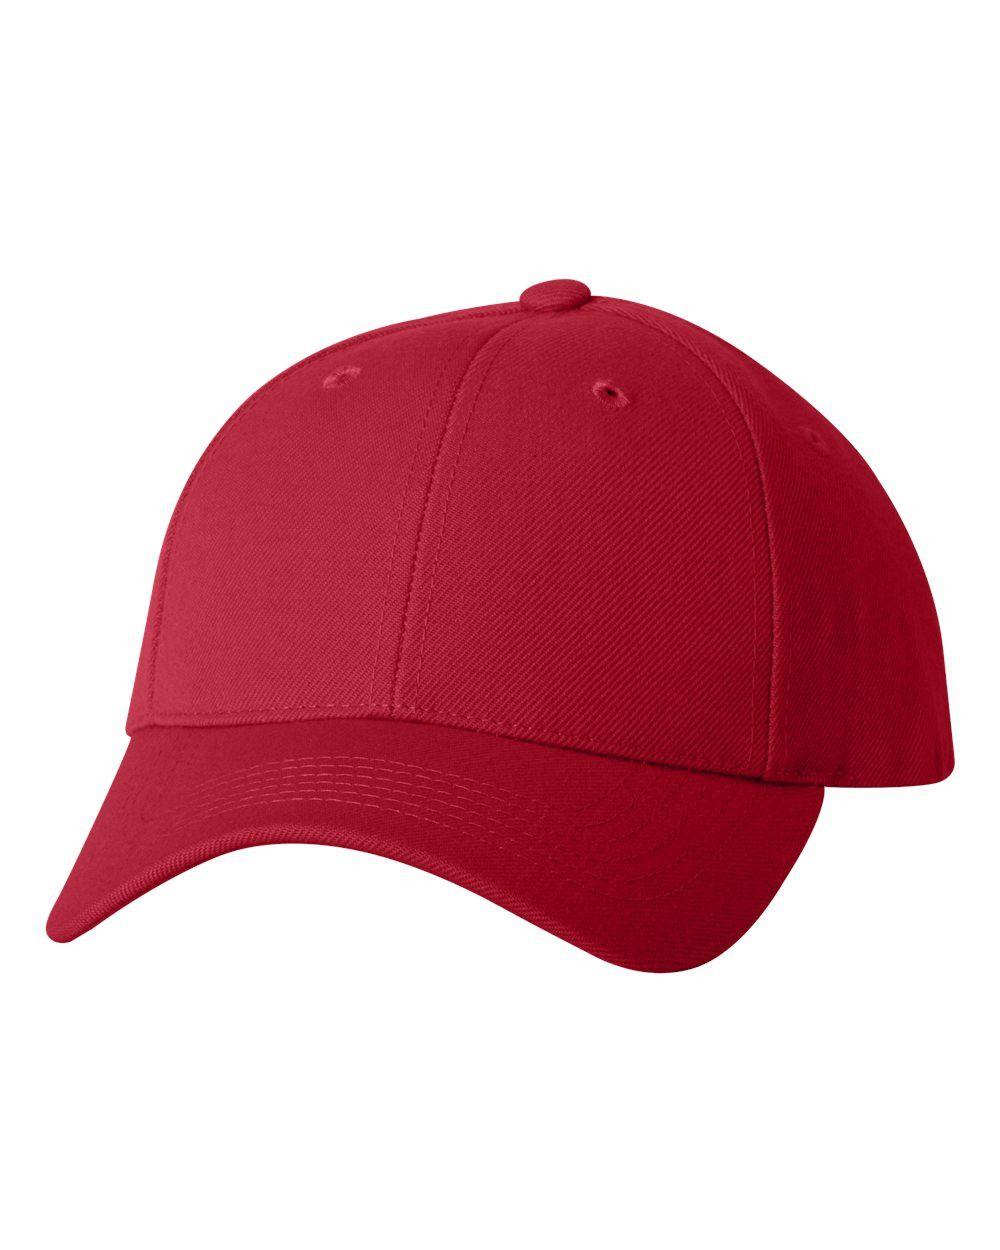 Sportsman - Wool Blend Cap - 2220 Red